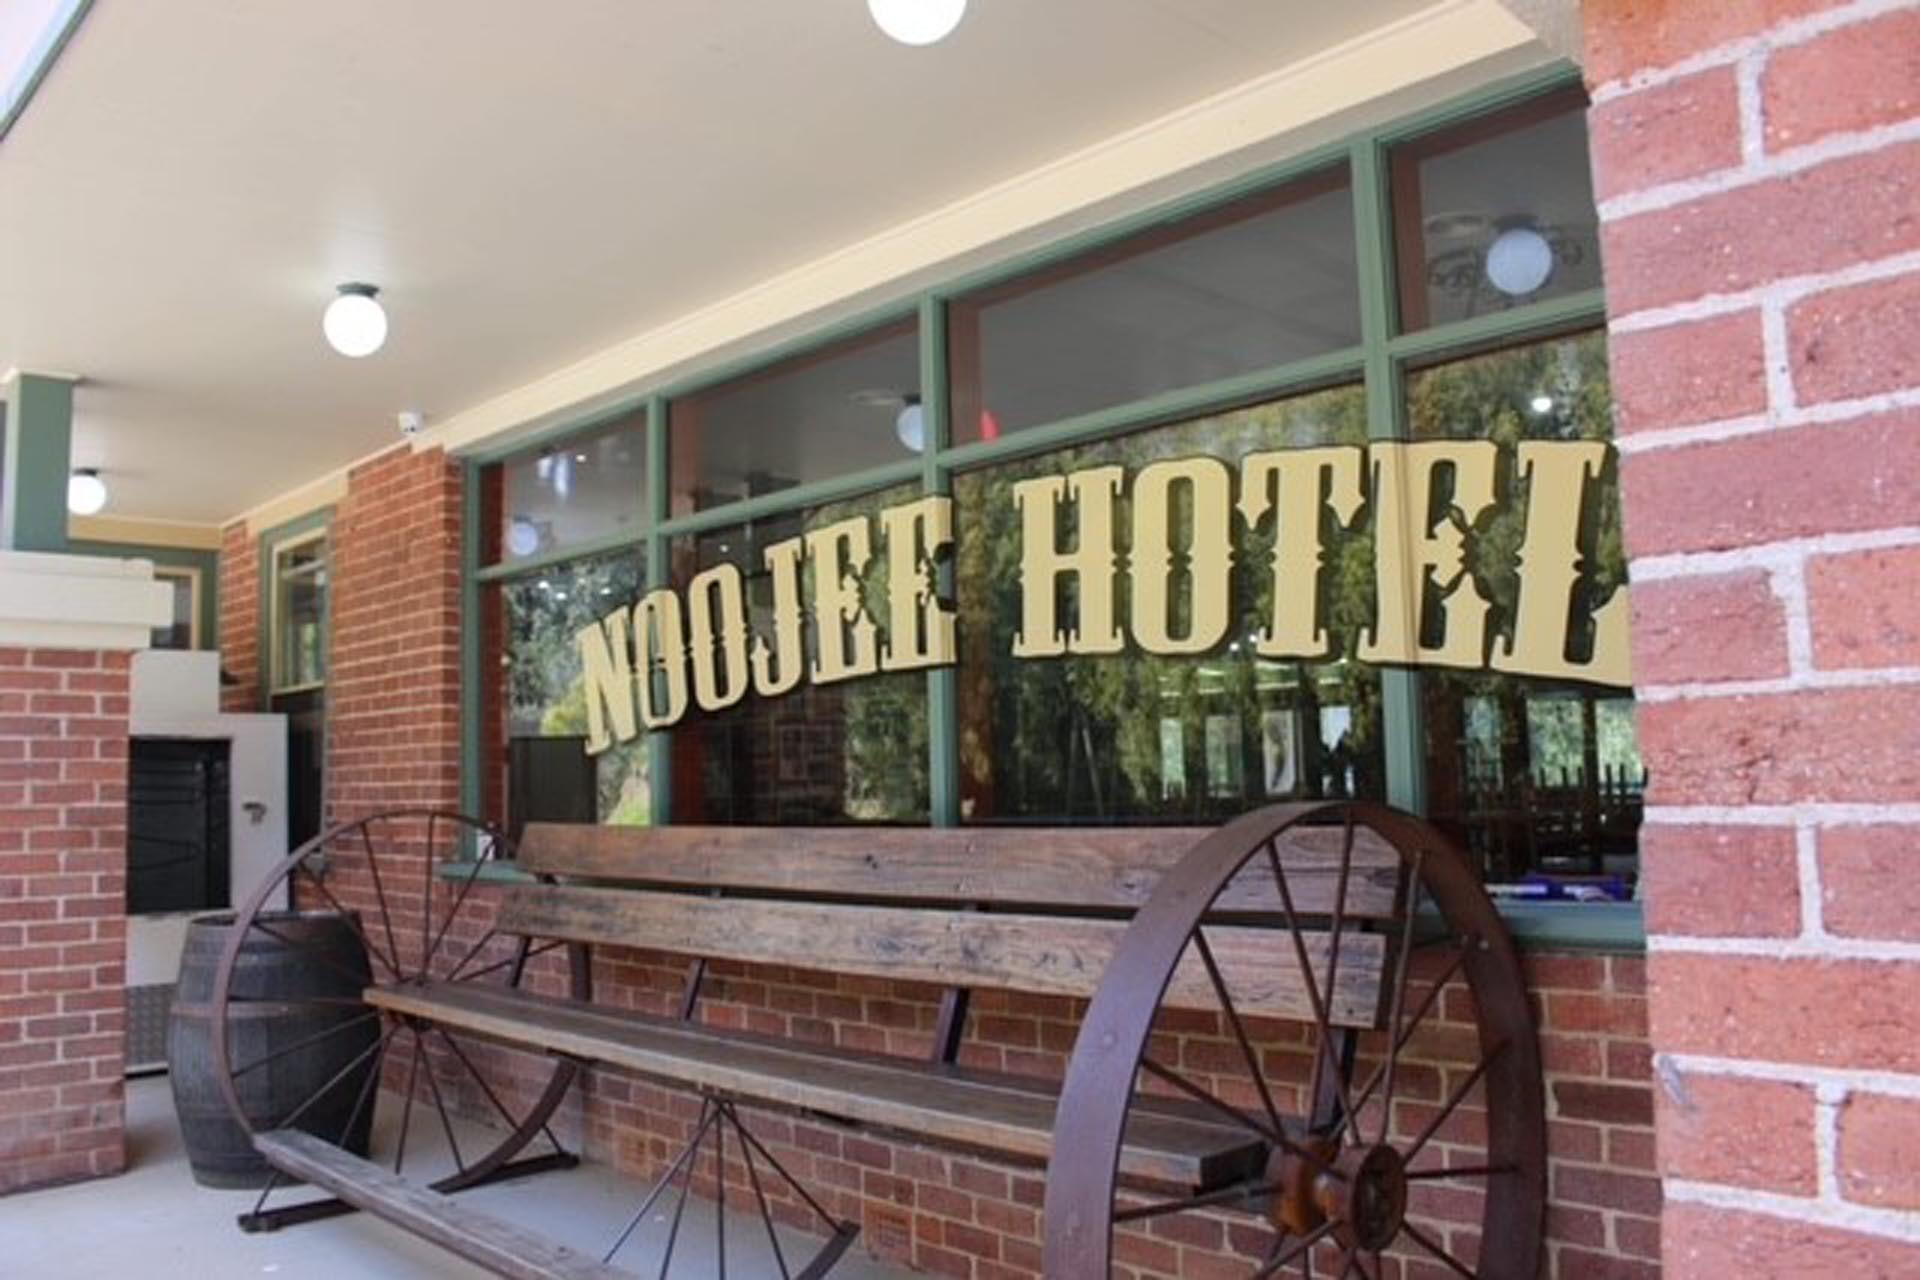 Noojee Hotel